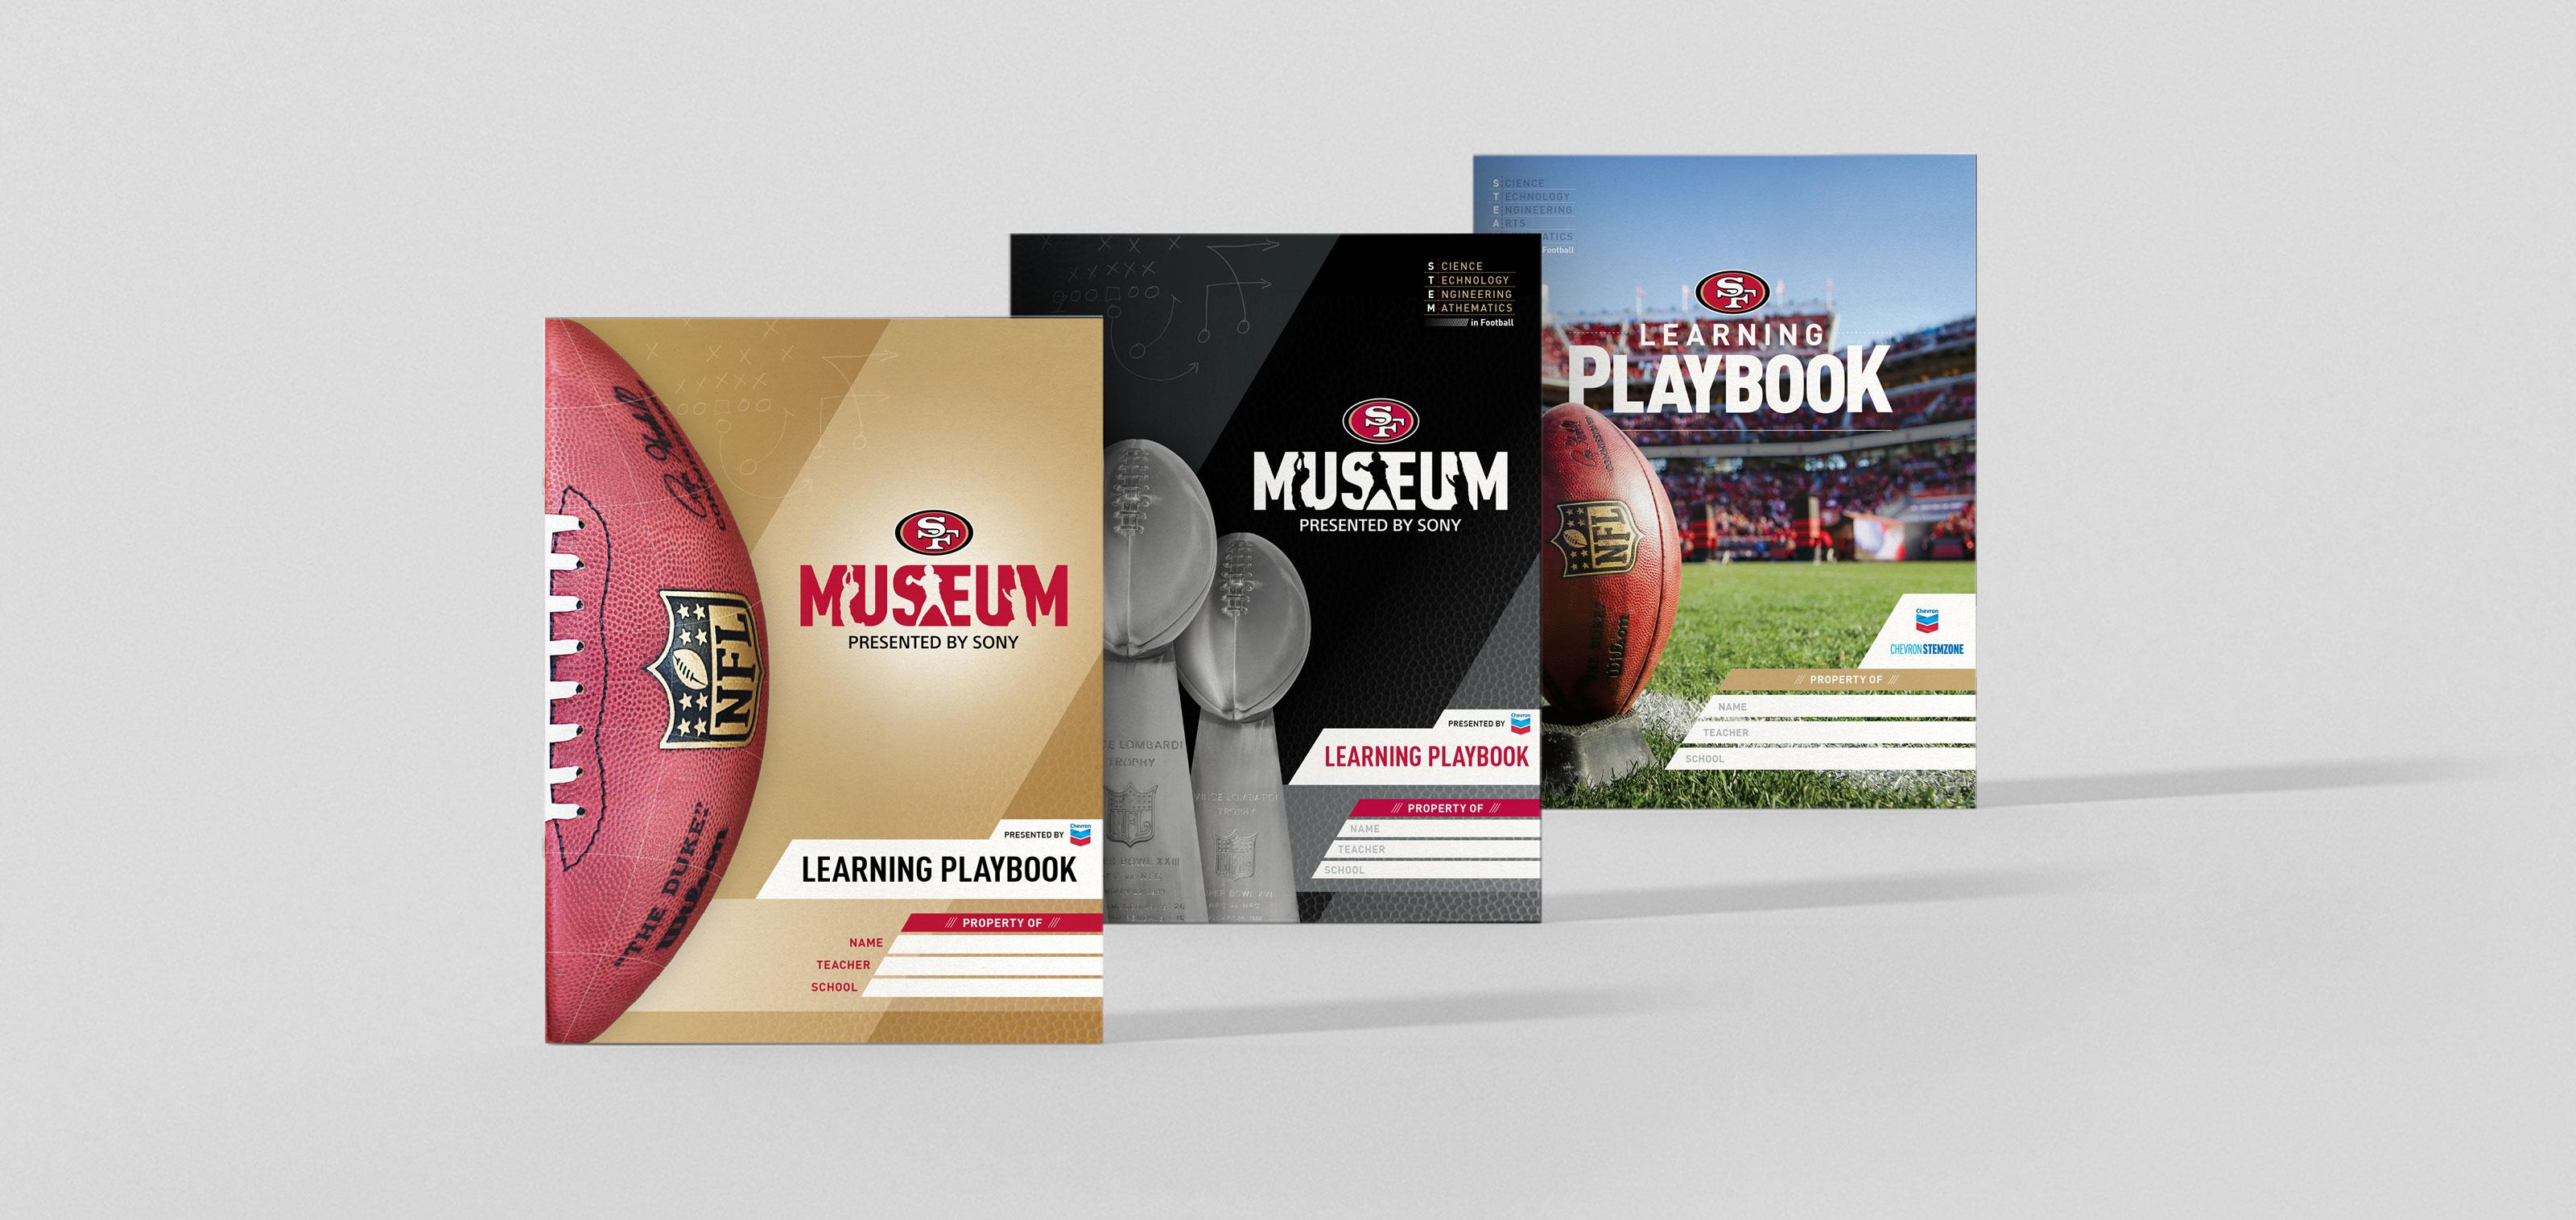 San Francisco 49ers Museum Education Playbook Design